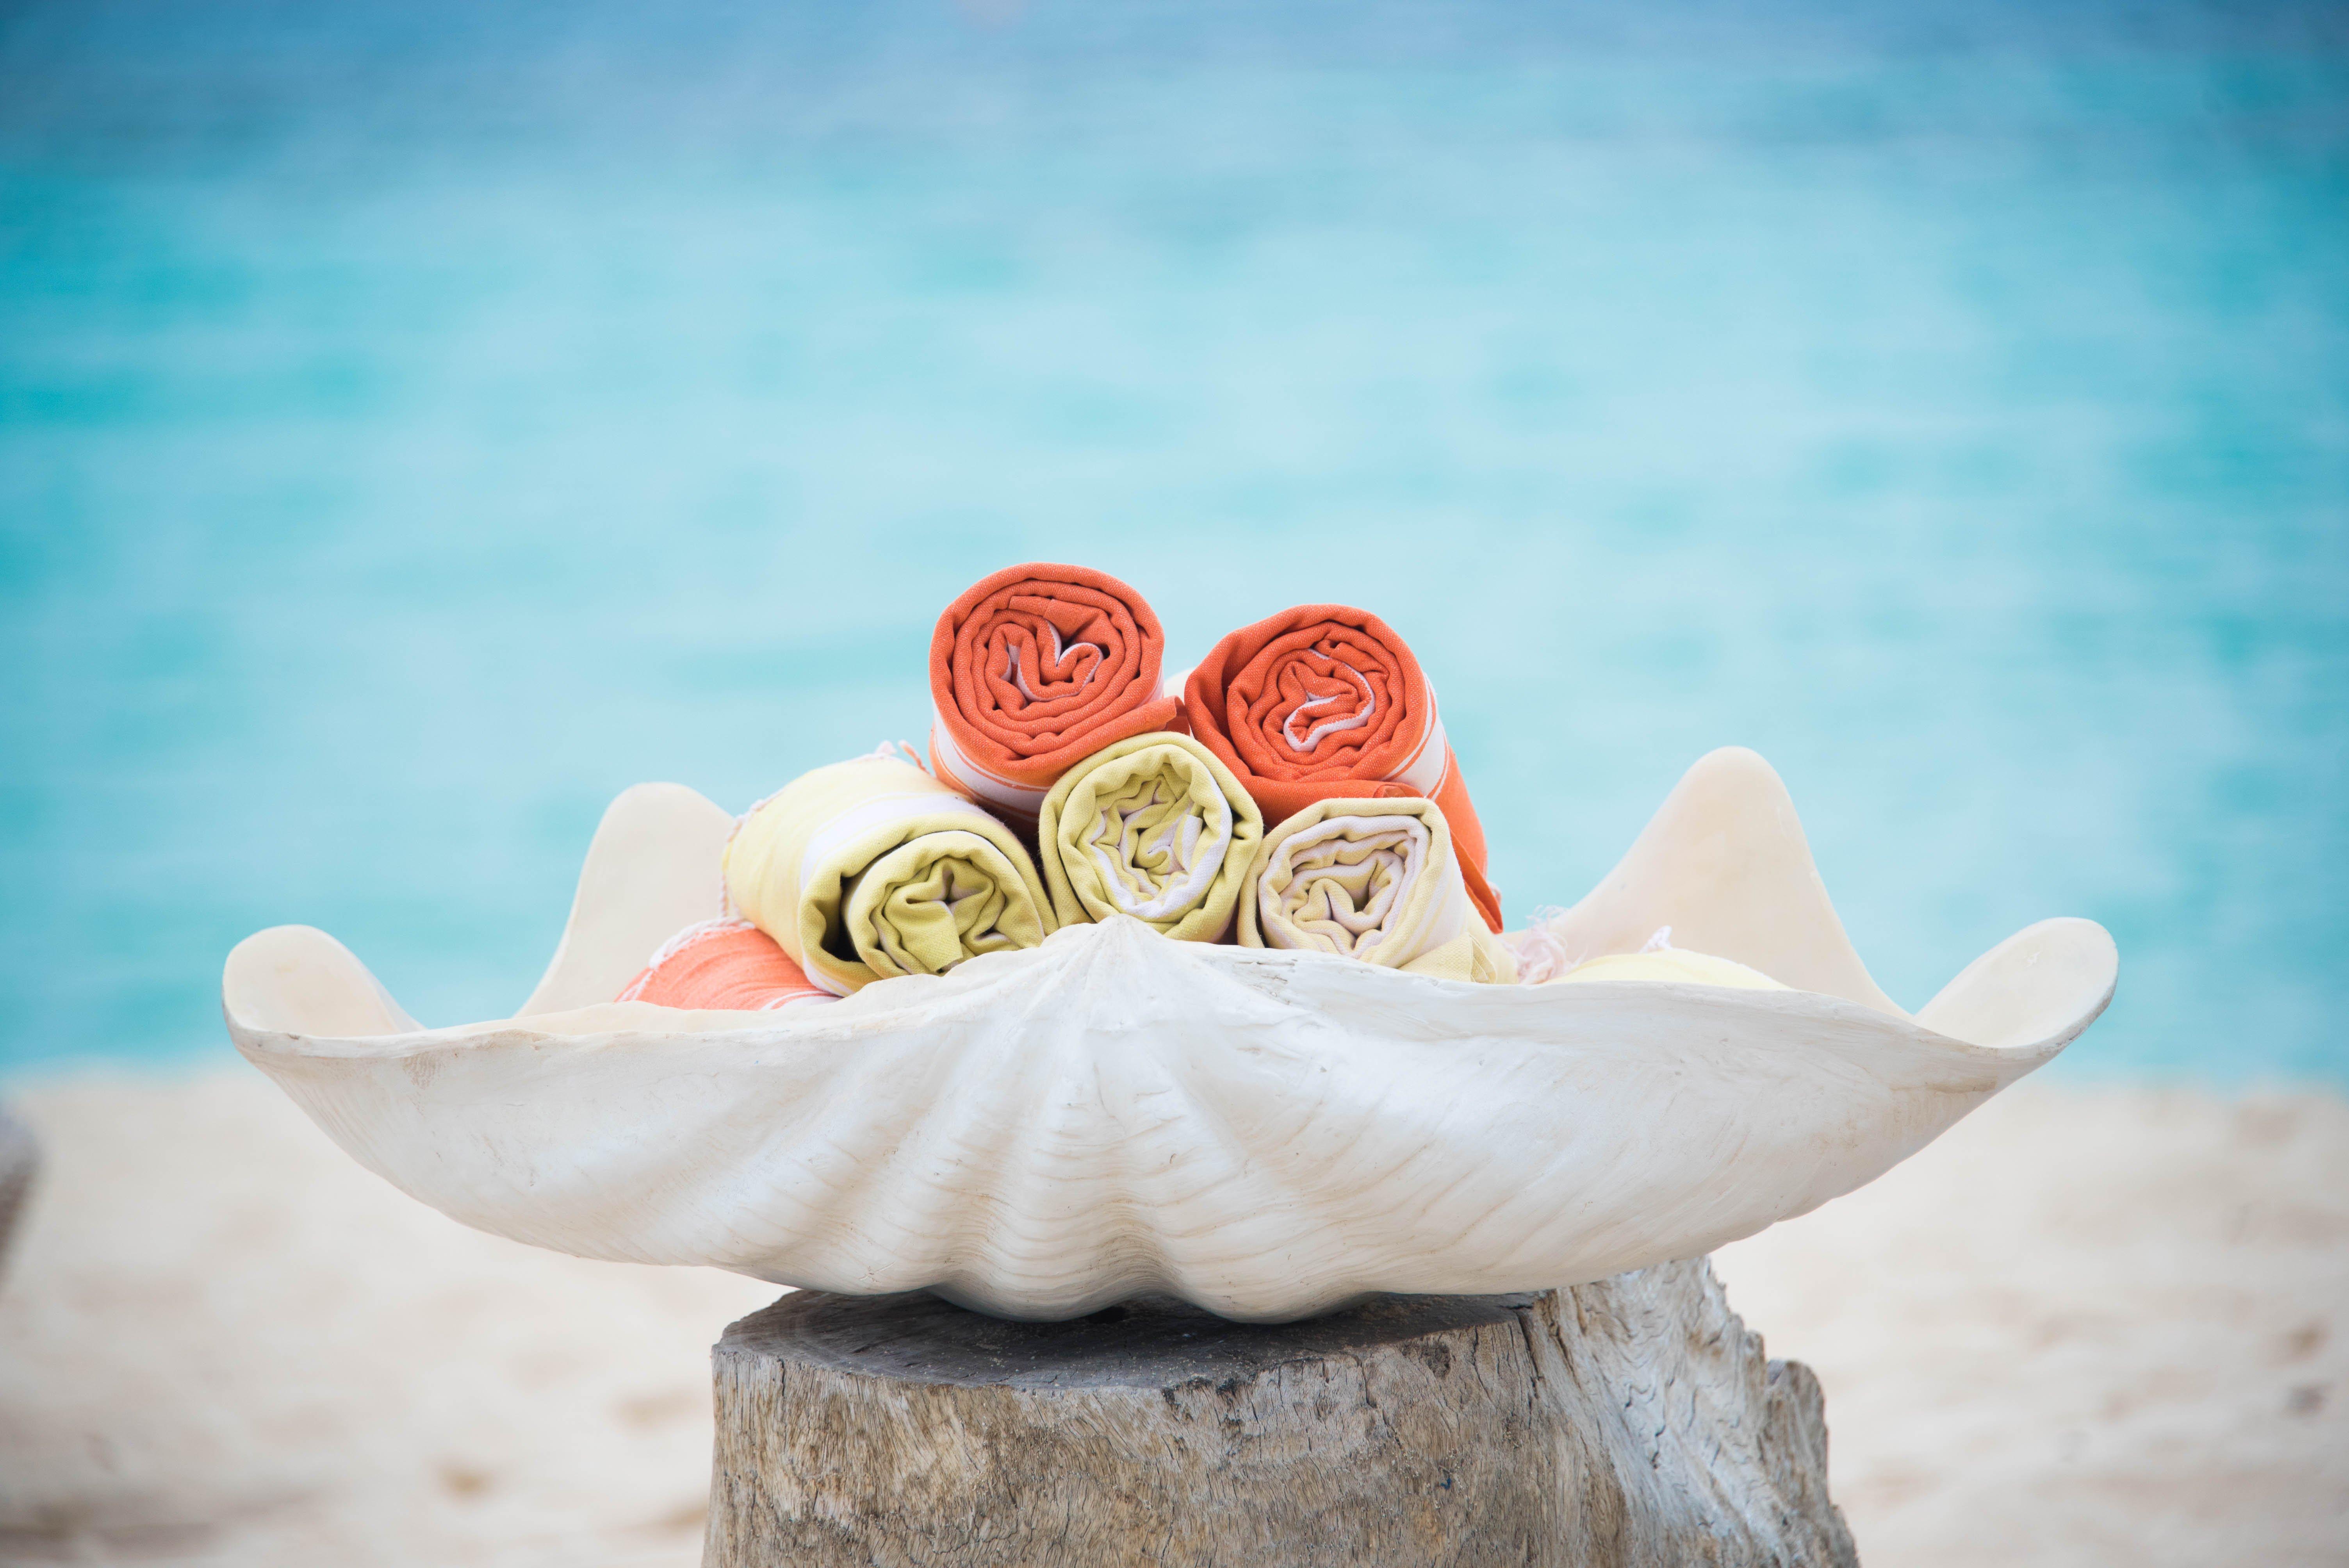 colourful_beach_towels_on_white_sea_shell_blurred_lagoon_background_boat_house